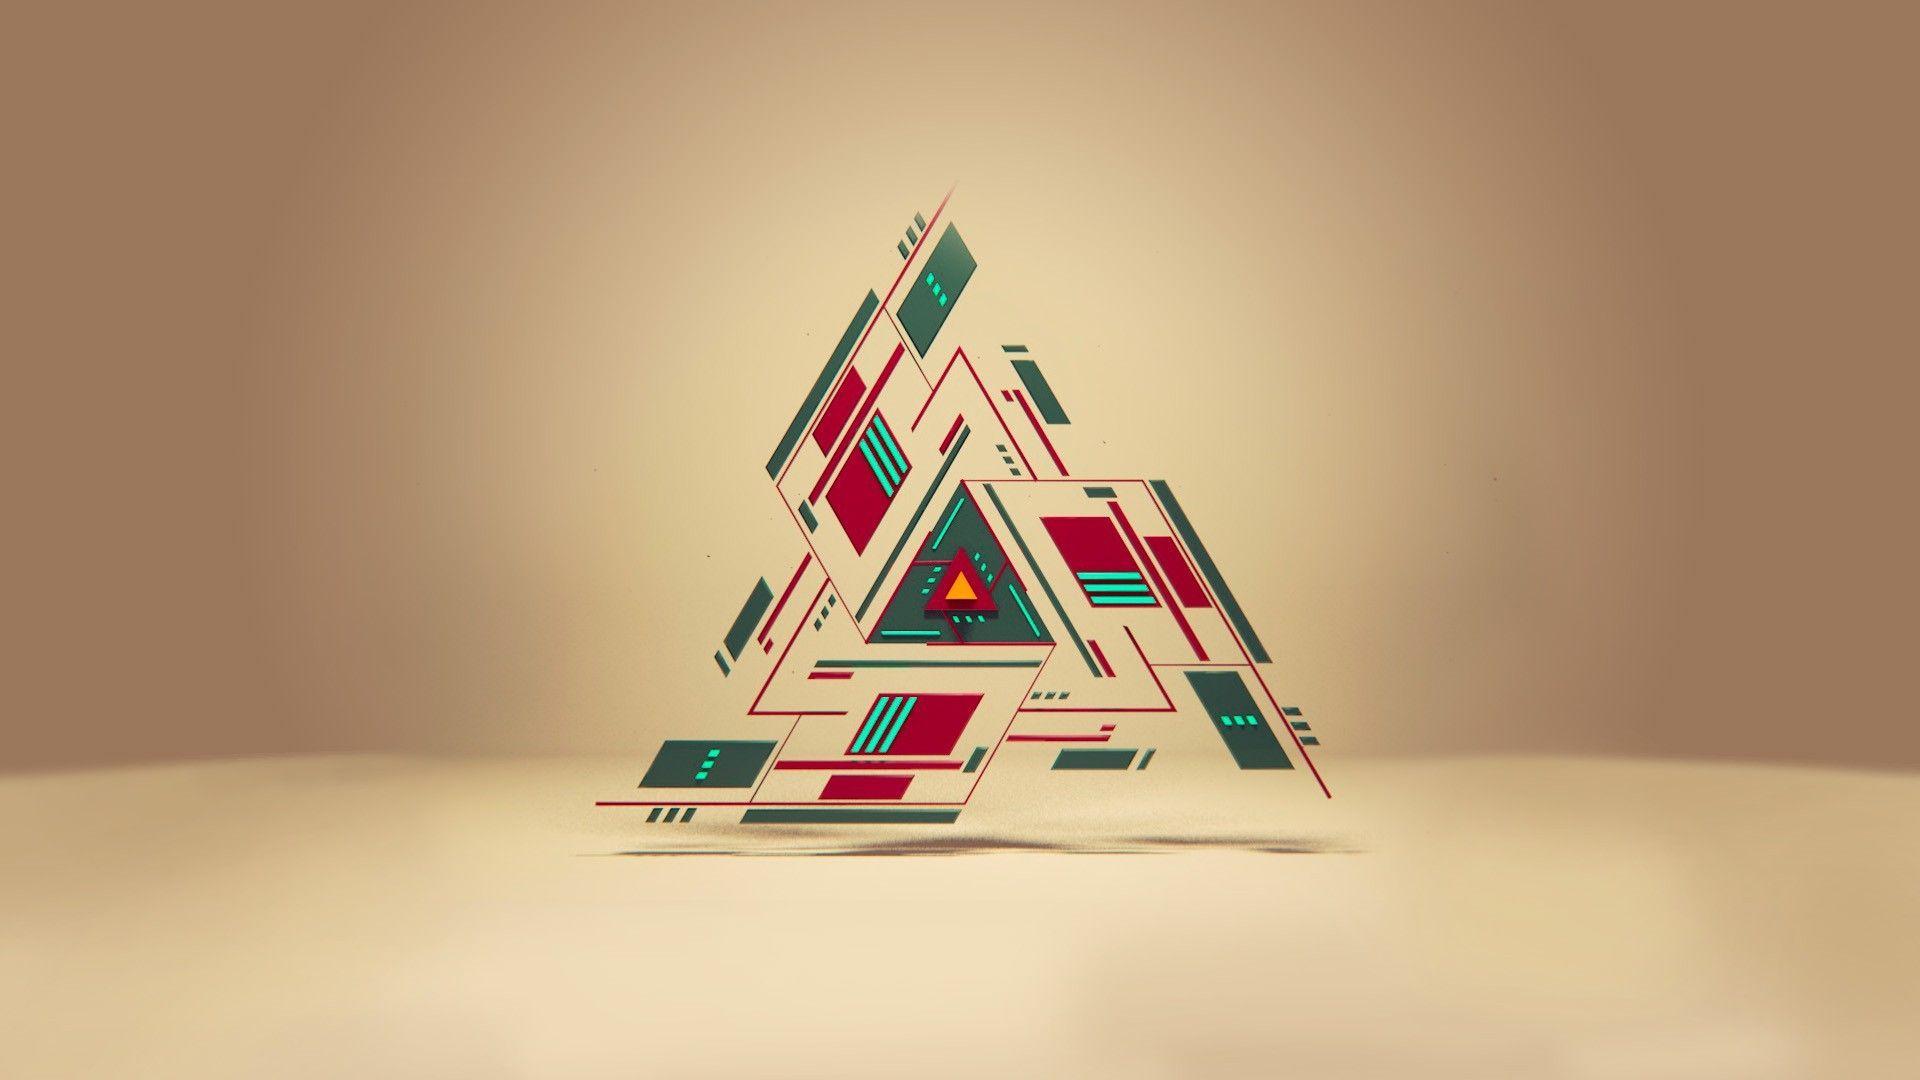 Geometric Shapes Wallpapers Top Free Geometric Shapes